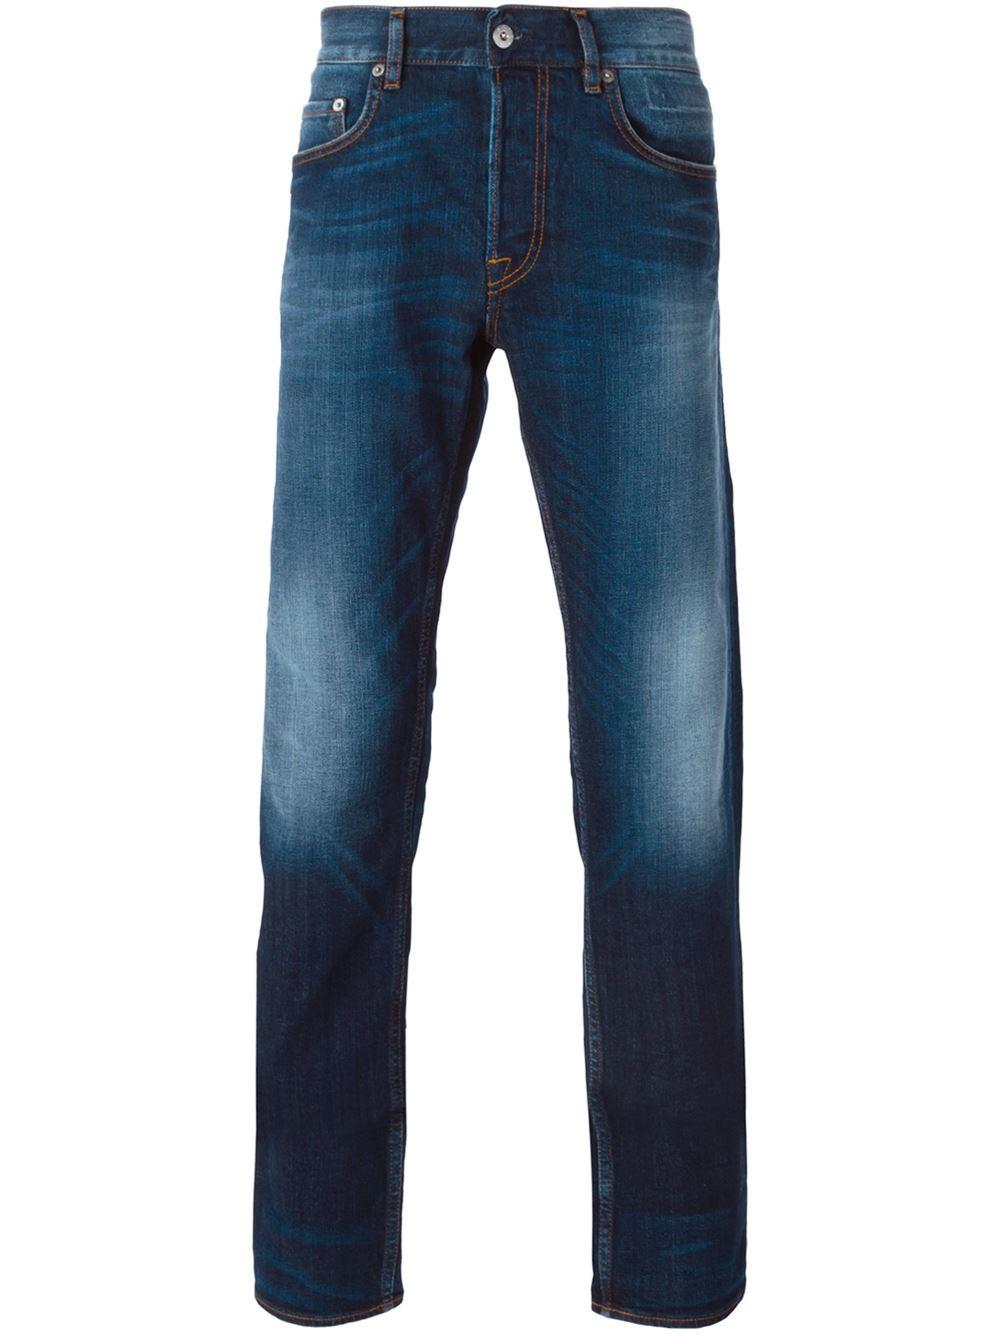 stone island slim washed jeans in blue for men lyst. Black Bedroom Furniture Sets. Home Design Ideas